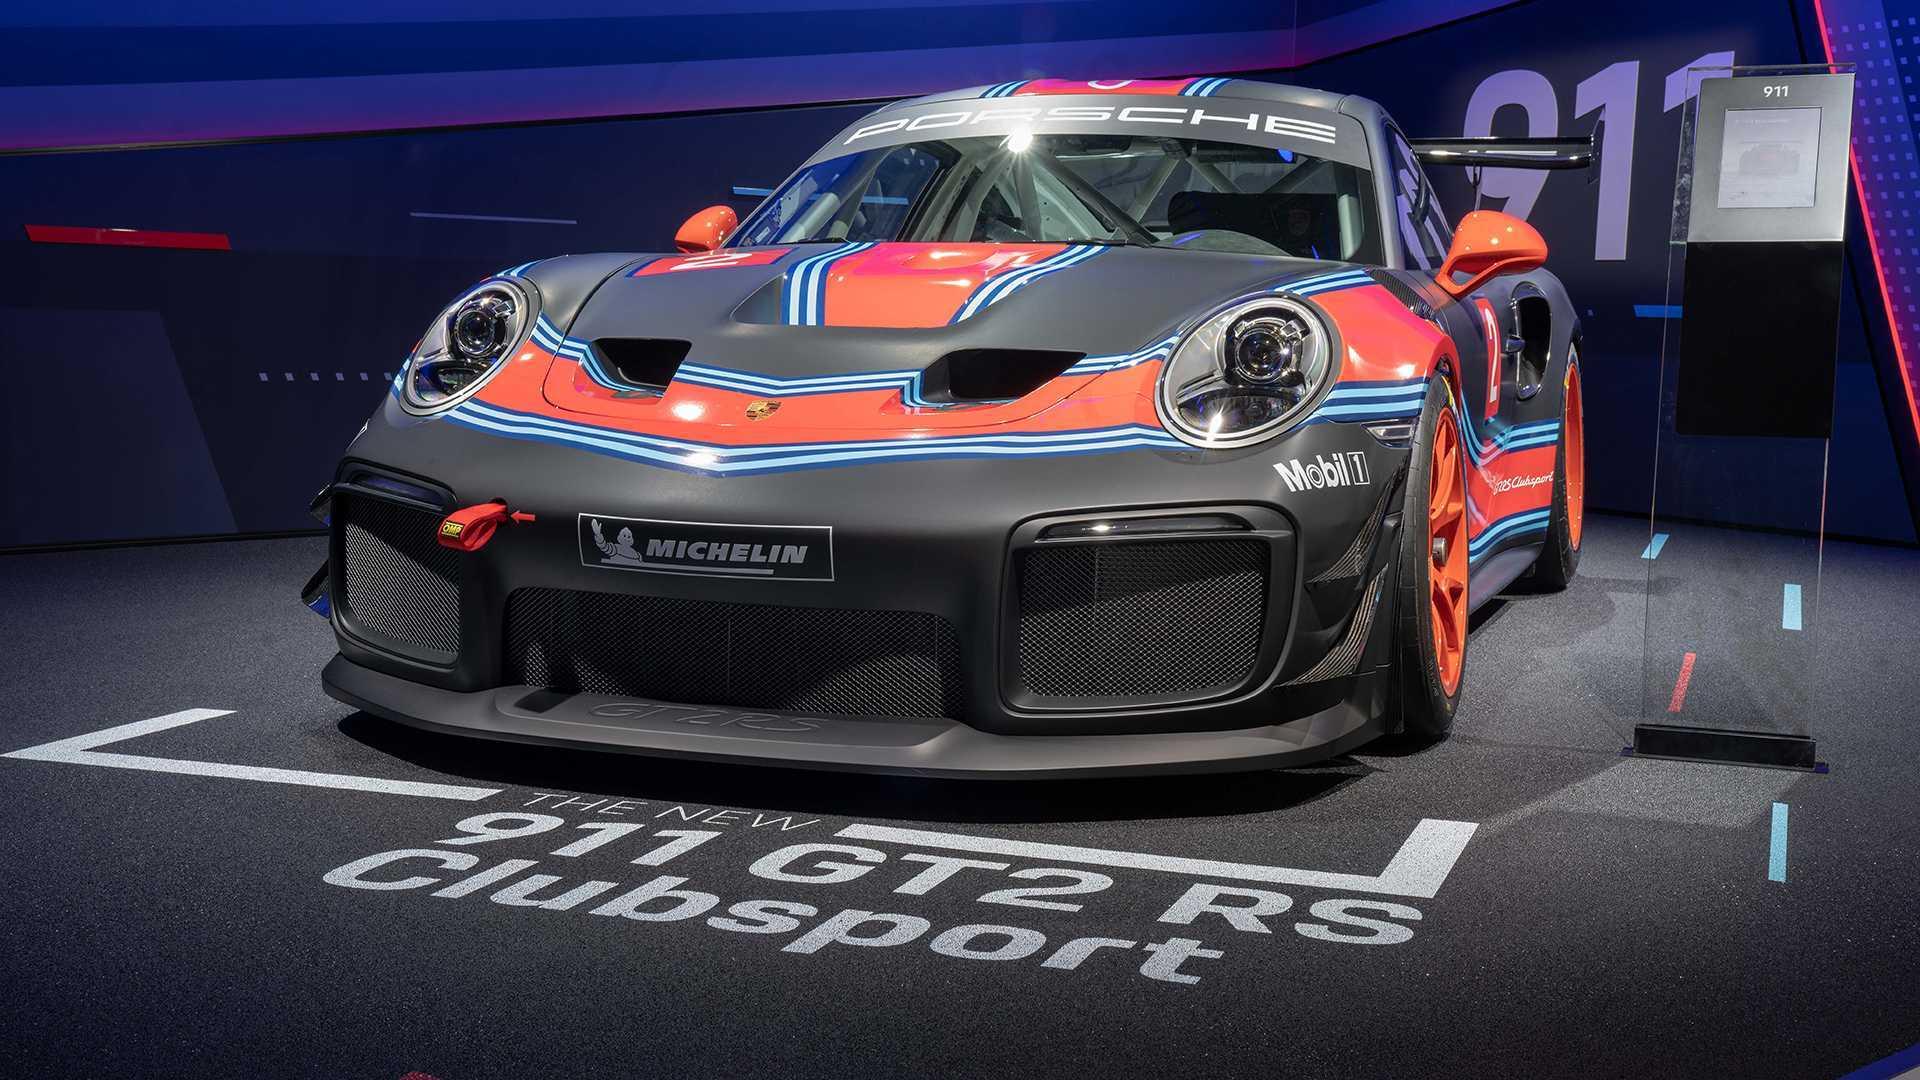 Porsche 911 GT2 RS Clubsport Makes Surprise Appearance In LA